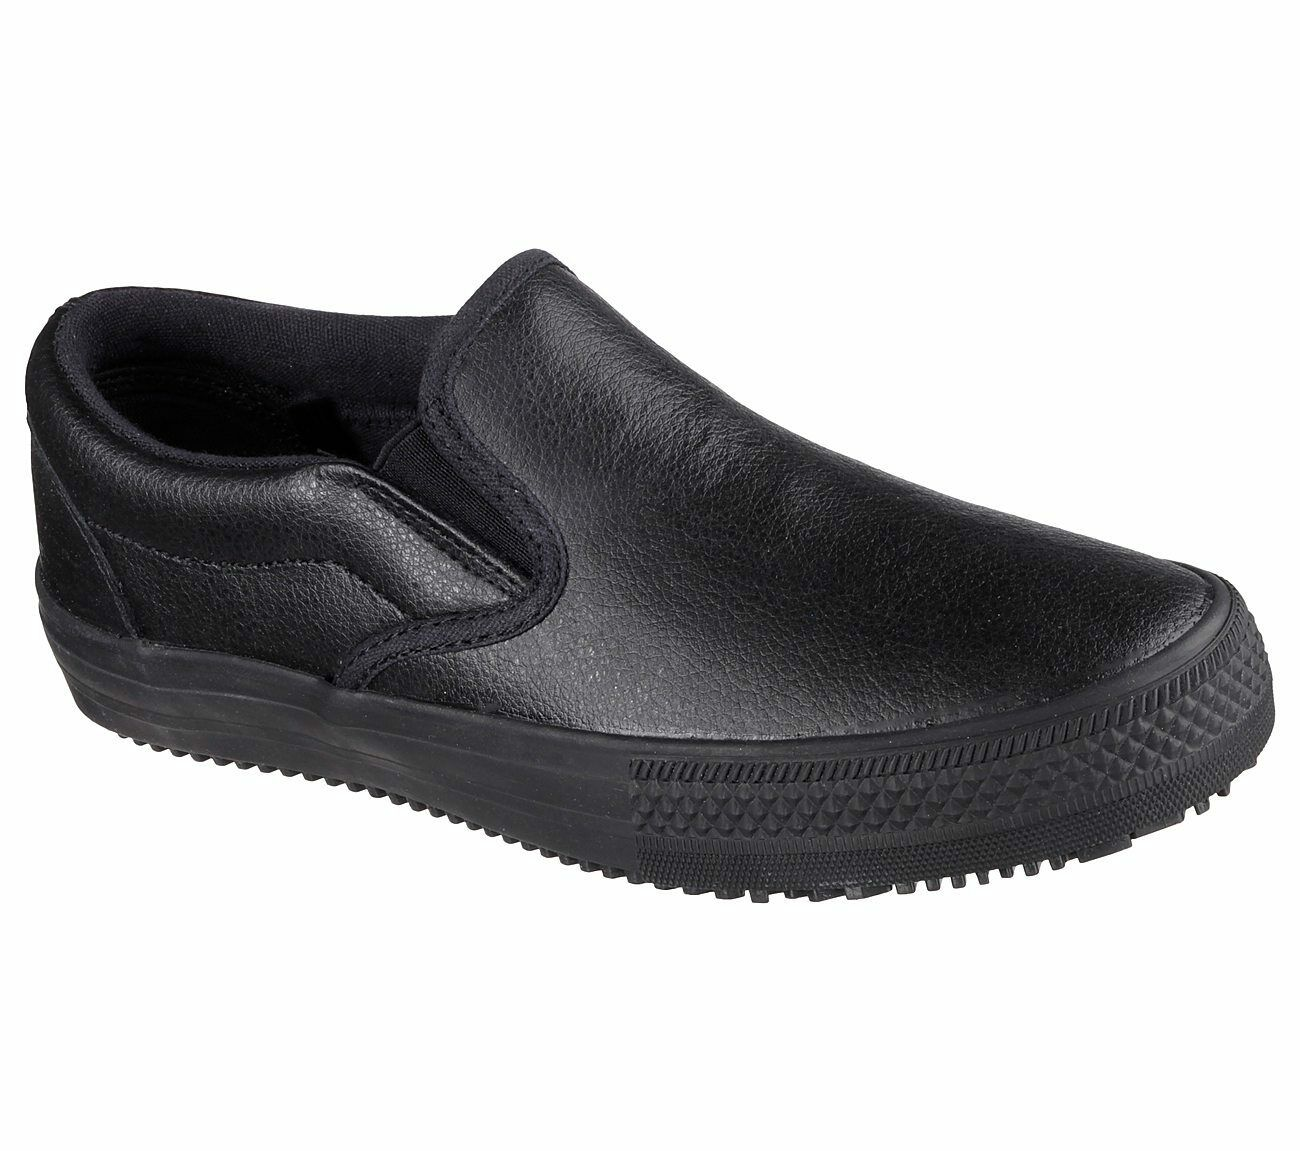 Skechers Gibson-Brogna Femme 76559 BLK noir Antidérapant Slip On chaussures